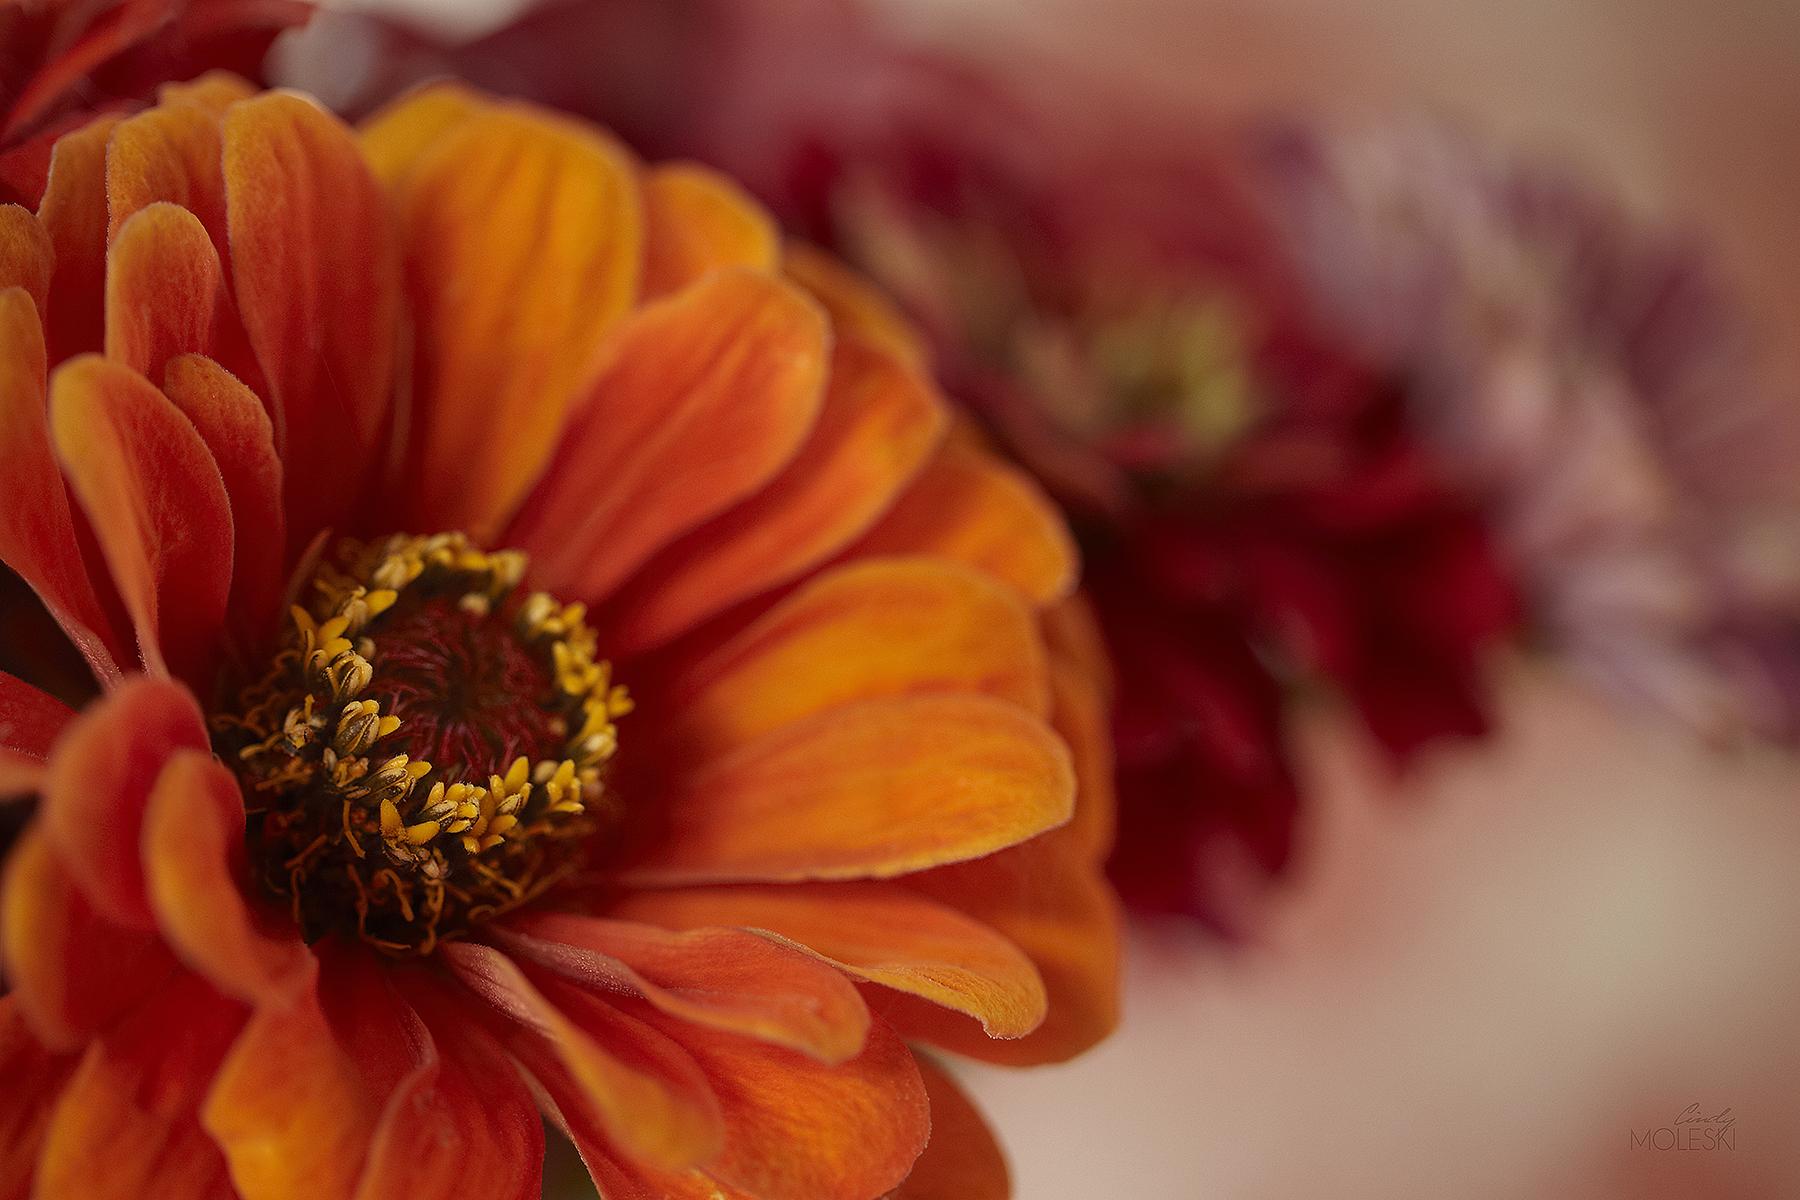 Old Fashioned-cindy-moleski-professional-photographer-saskatoon-saskatchewan-floral-zinnia-orange-red-russet-burgundy-lavender-violet-purpleFB.jpg